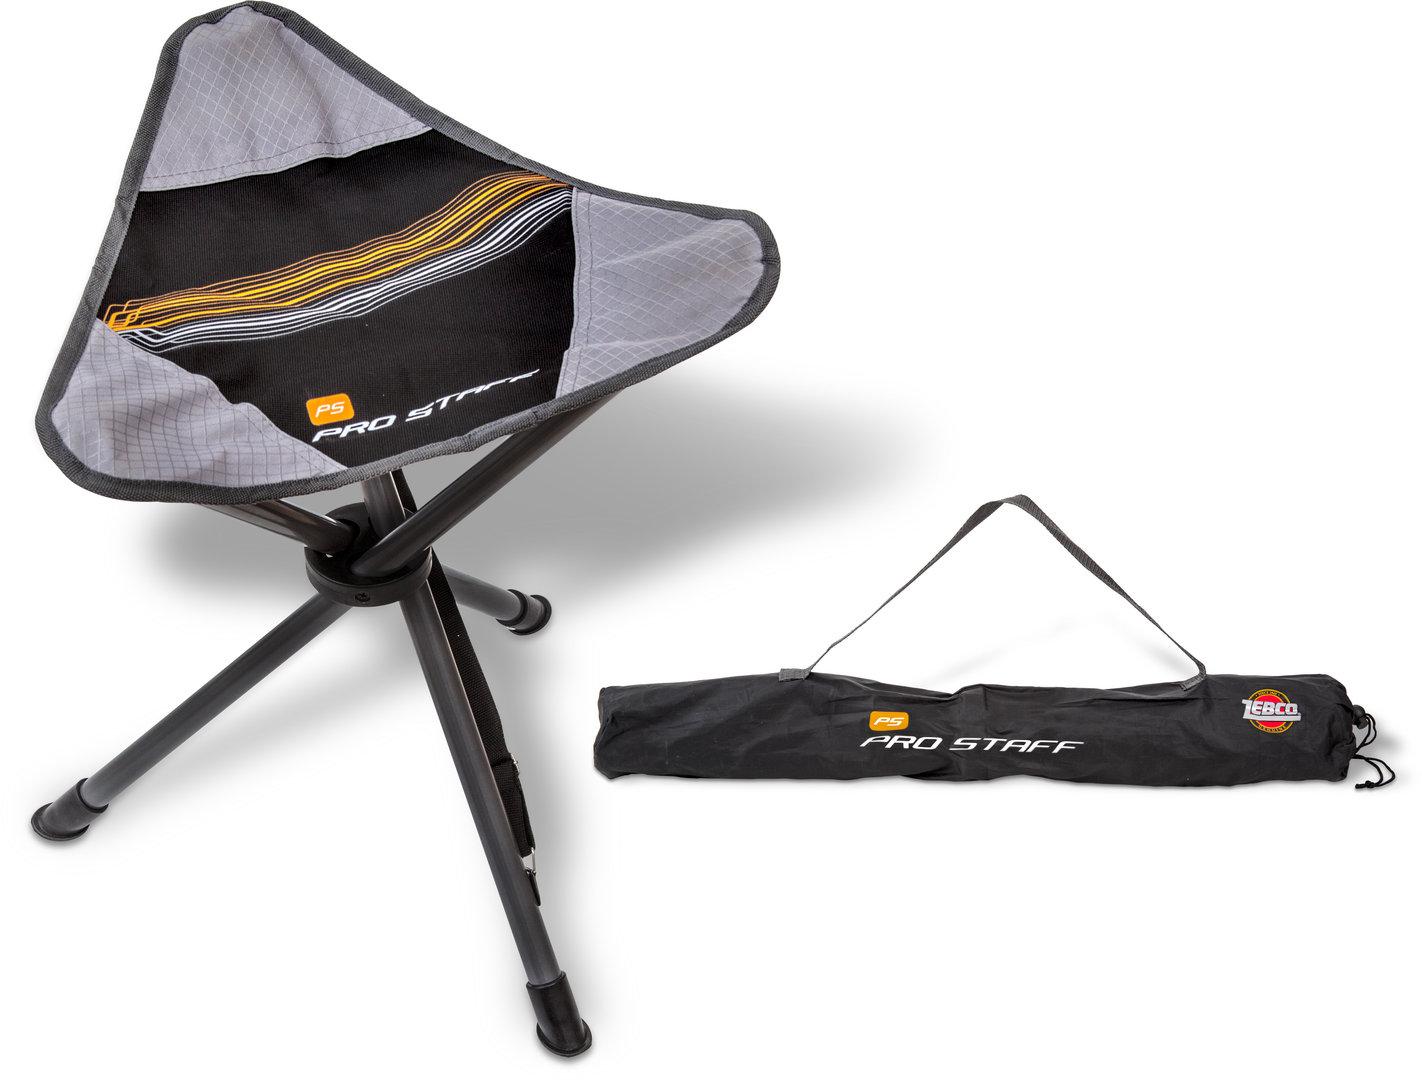 zebco fishing chair free standing hammock pro staff day walker angelstuhl klappstuhl faltstuhl